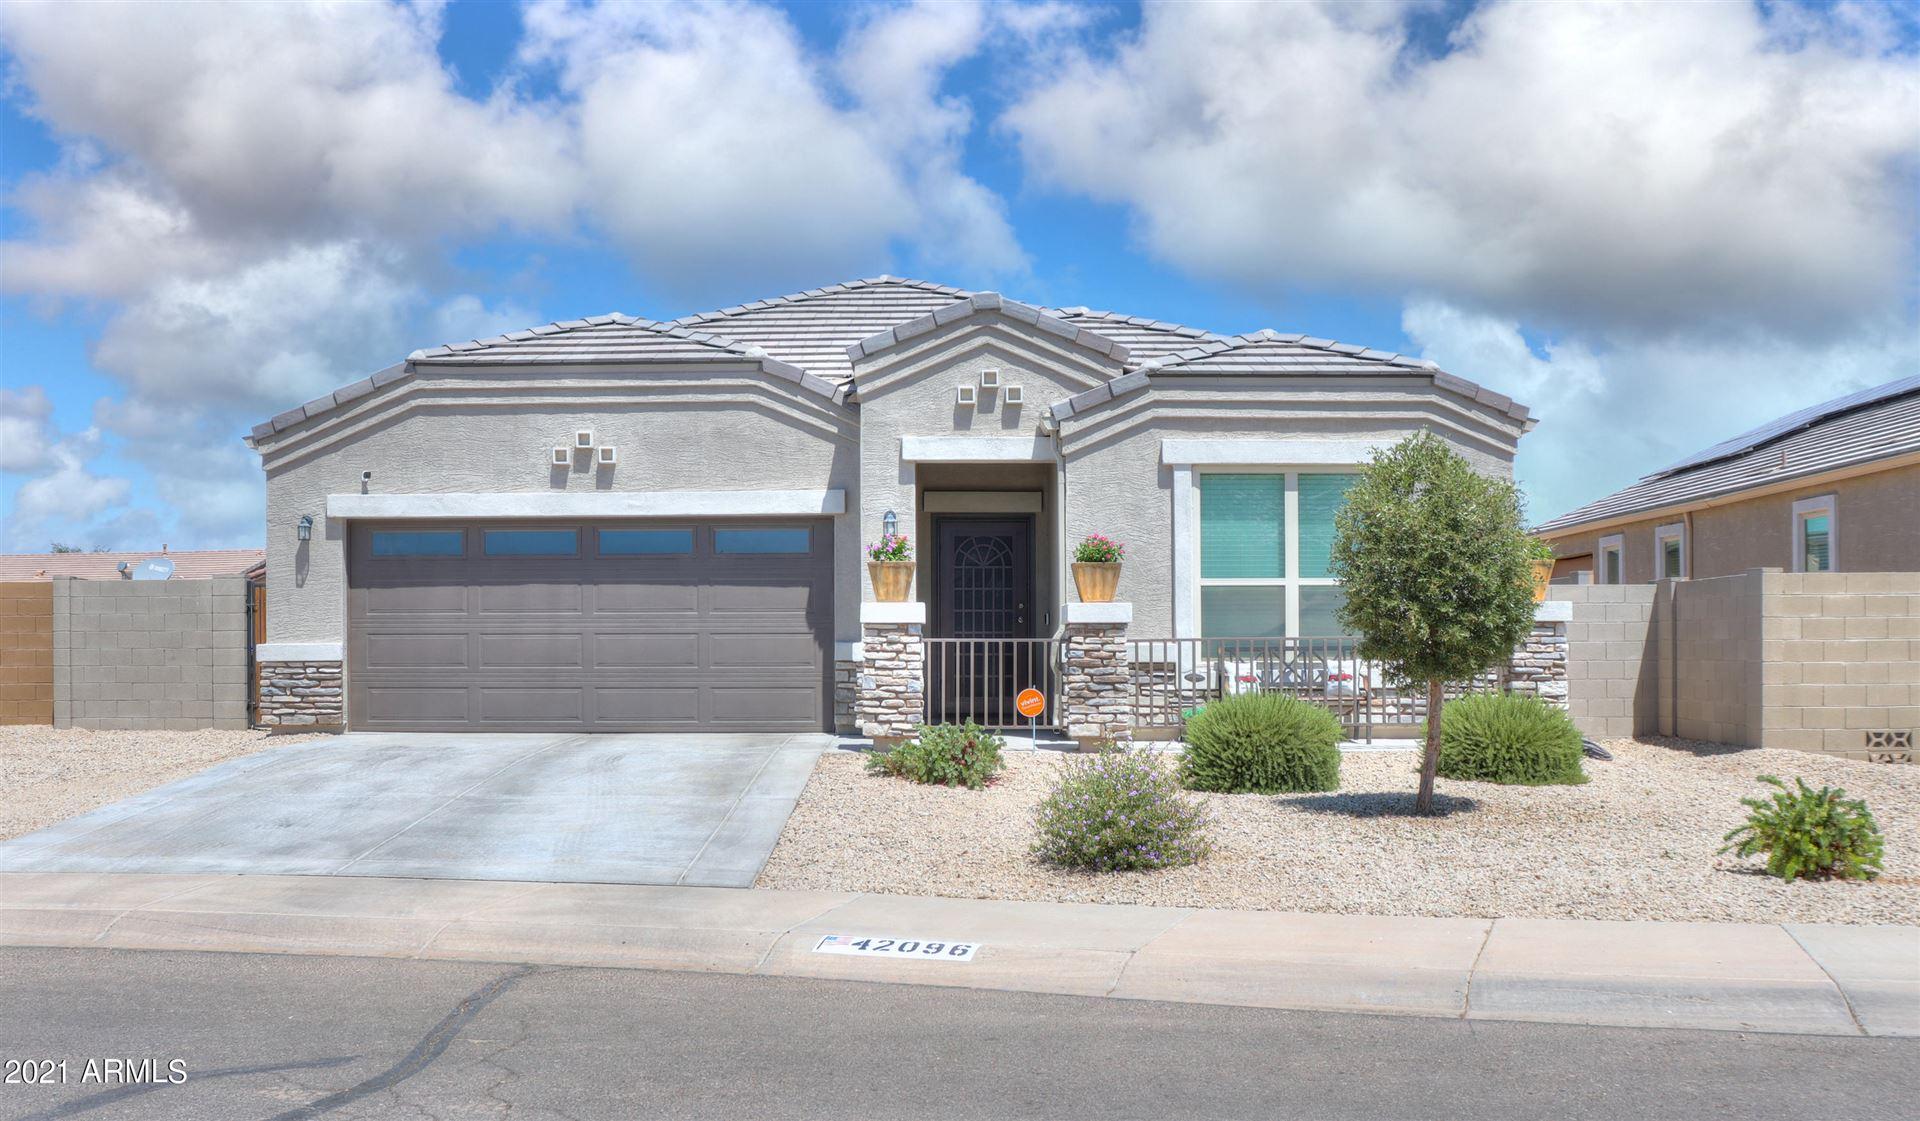 42096 W QUINTO Drive, Maricopa, AZ 85138 - MLS#: 6262494